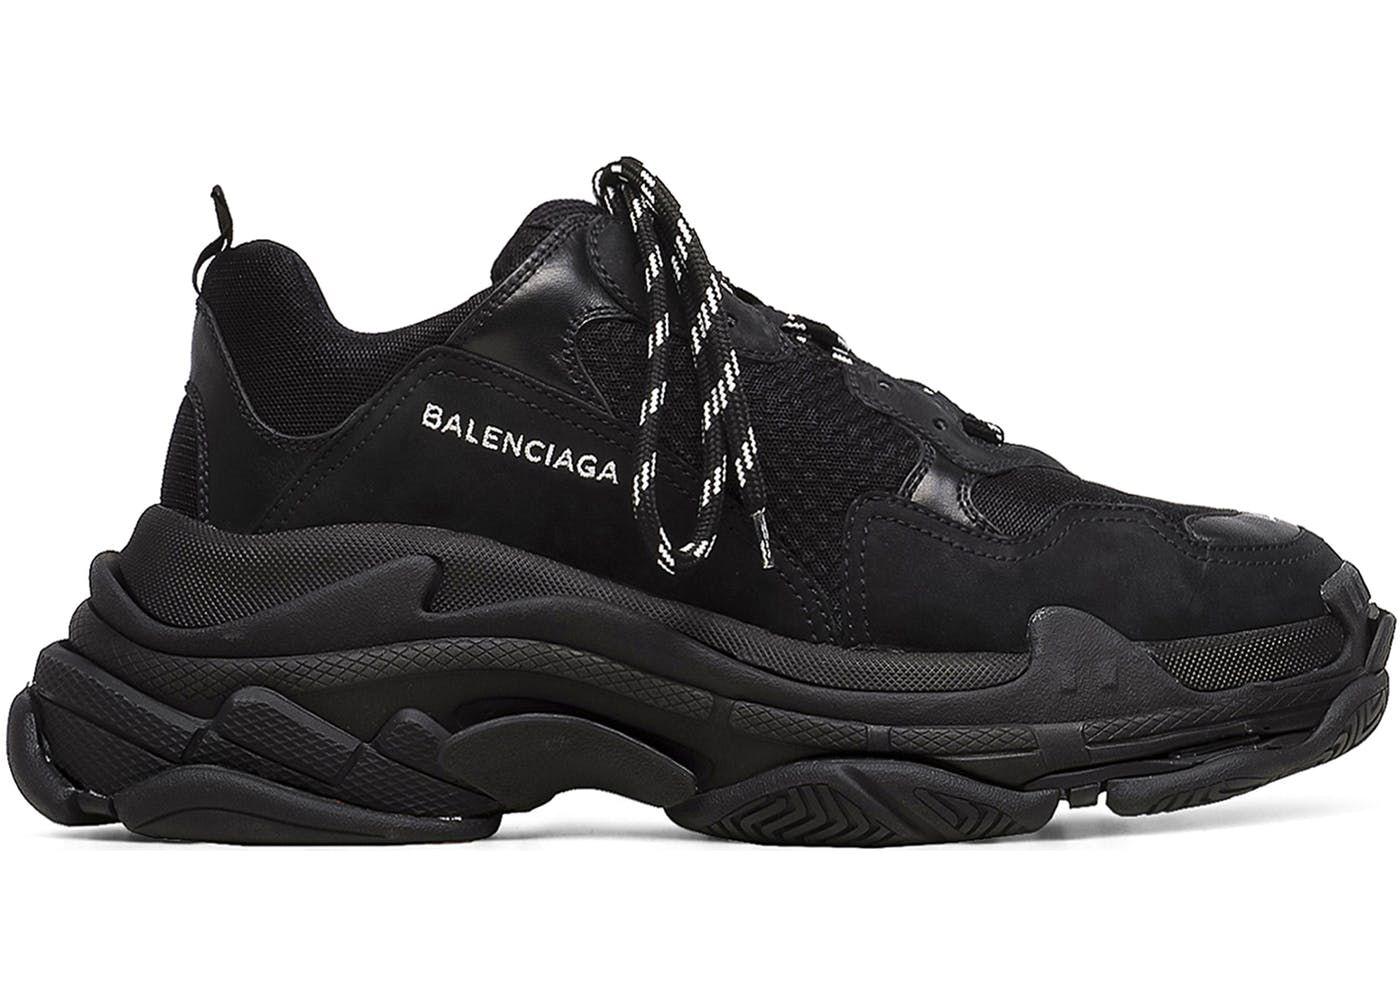 294de9ec1596 Balenciaga Mens Triple S Sneaker All White STYL3Z Guide